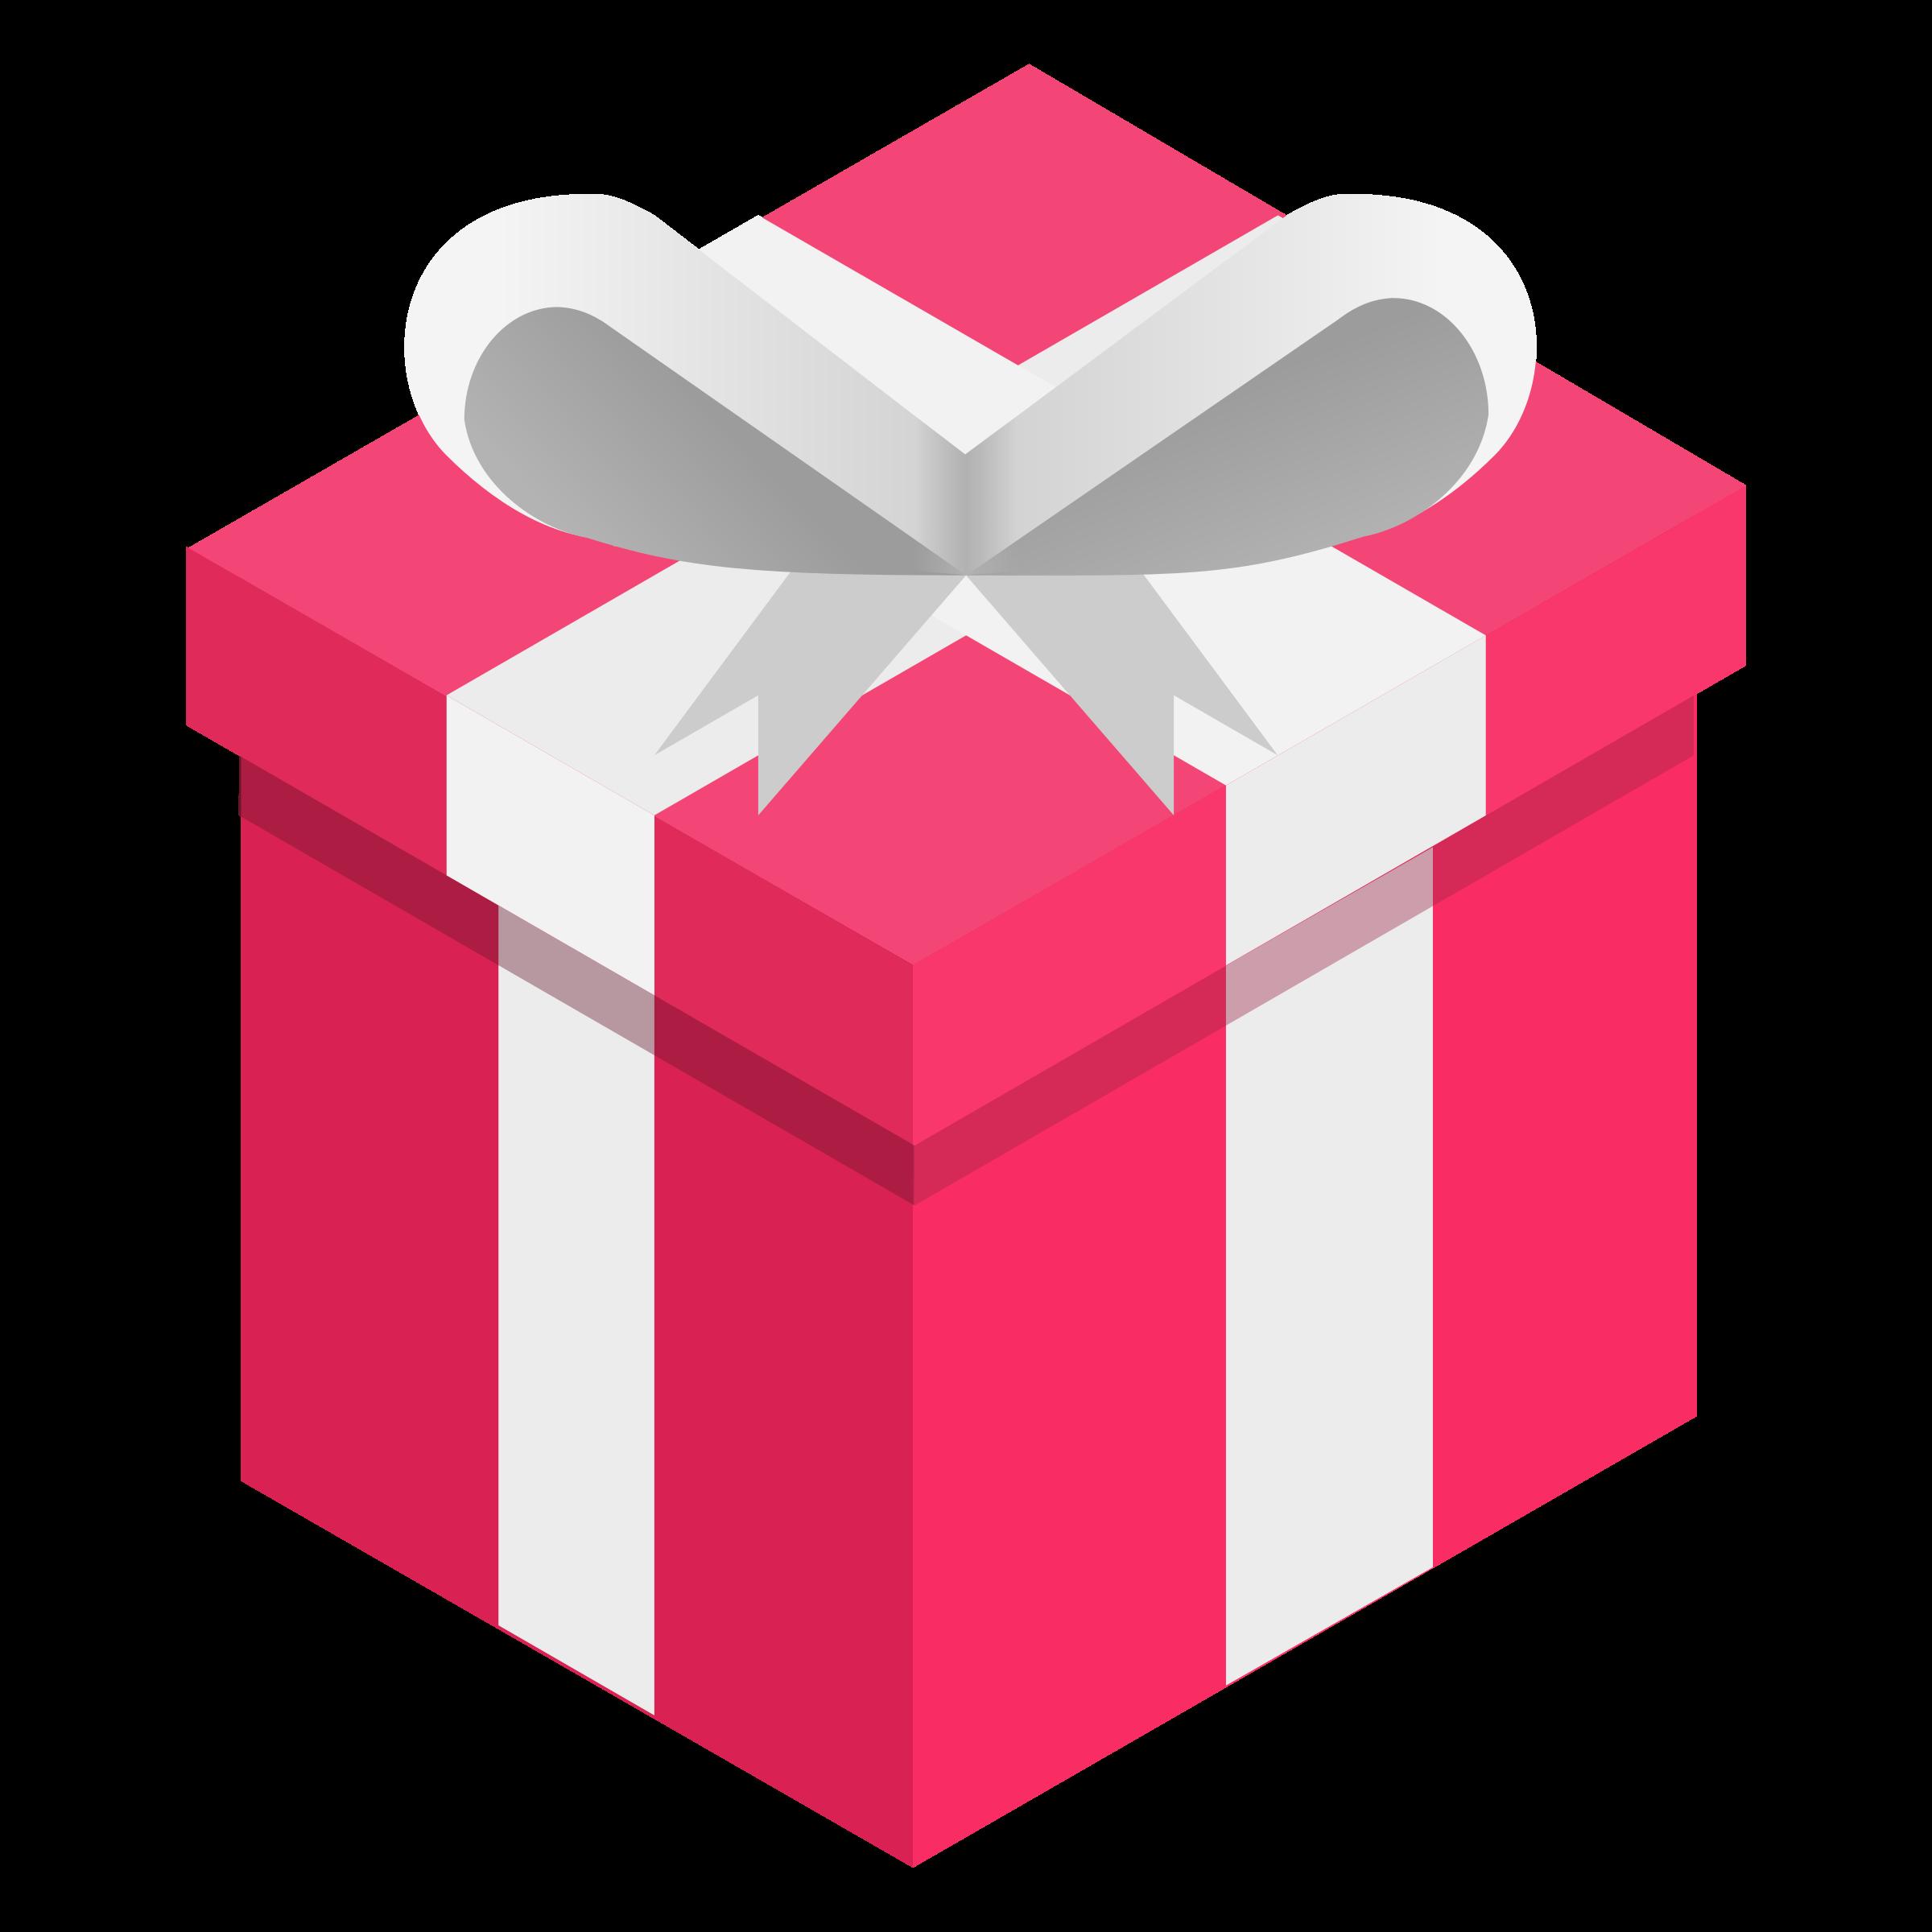 gift box clipart panda free clipart images rh clipartpanda com clipart images gift box gift box clip art free